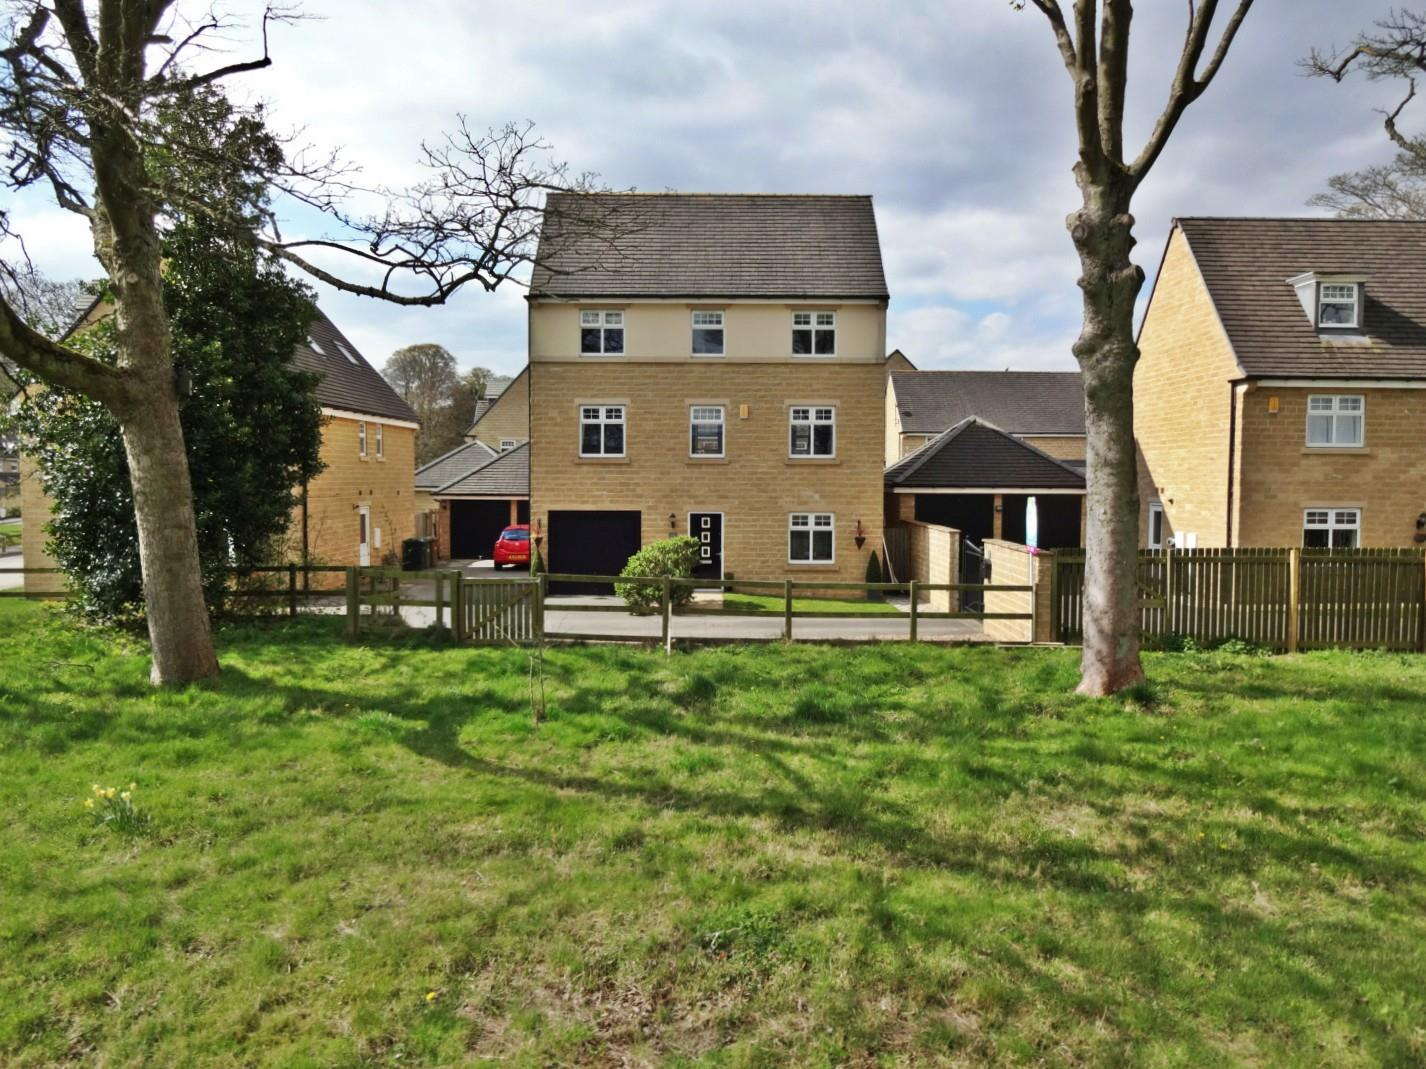 Beamsley Walk, Menston, LS29 6FJ